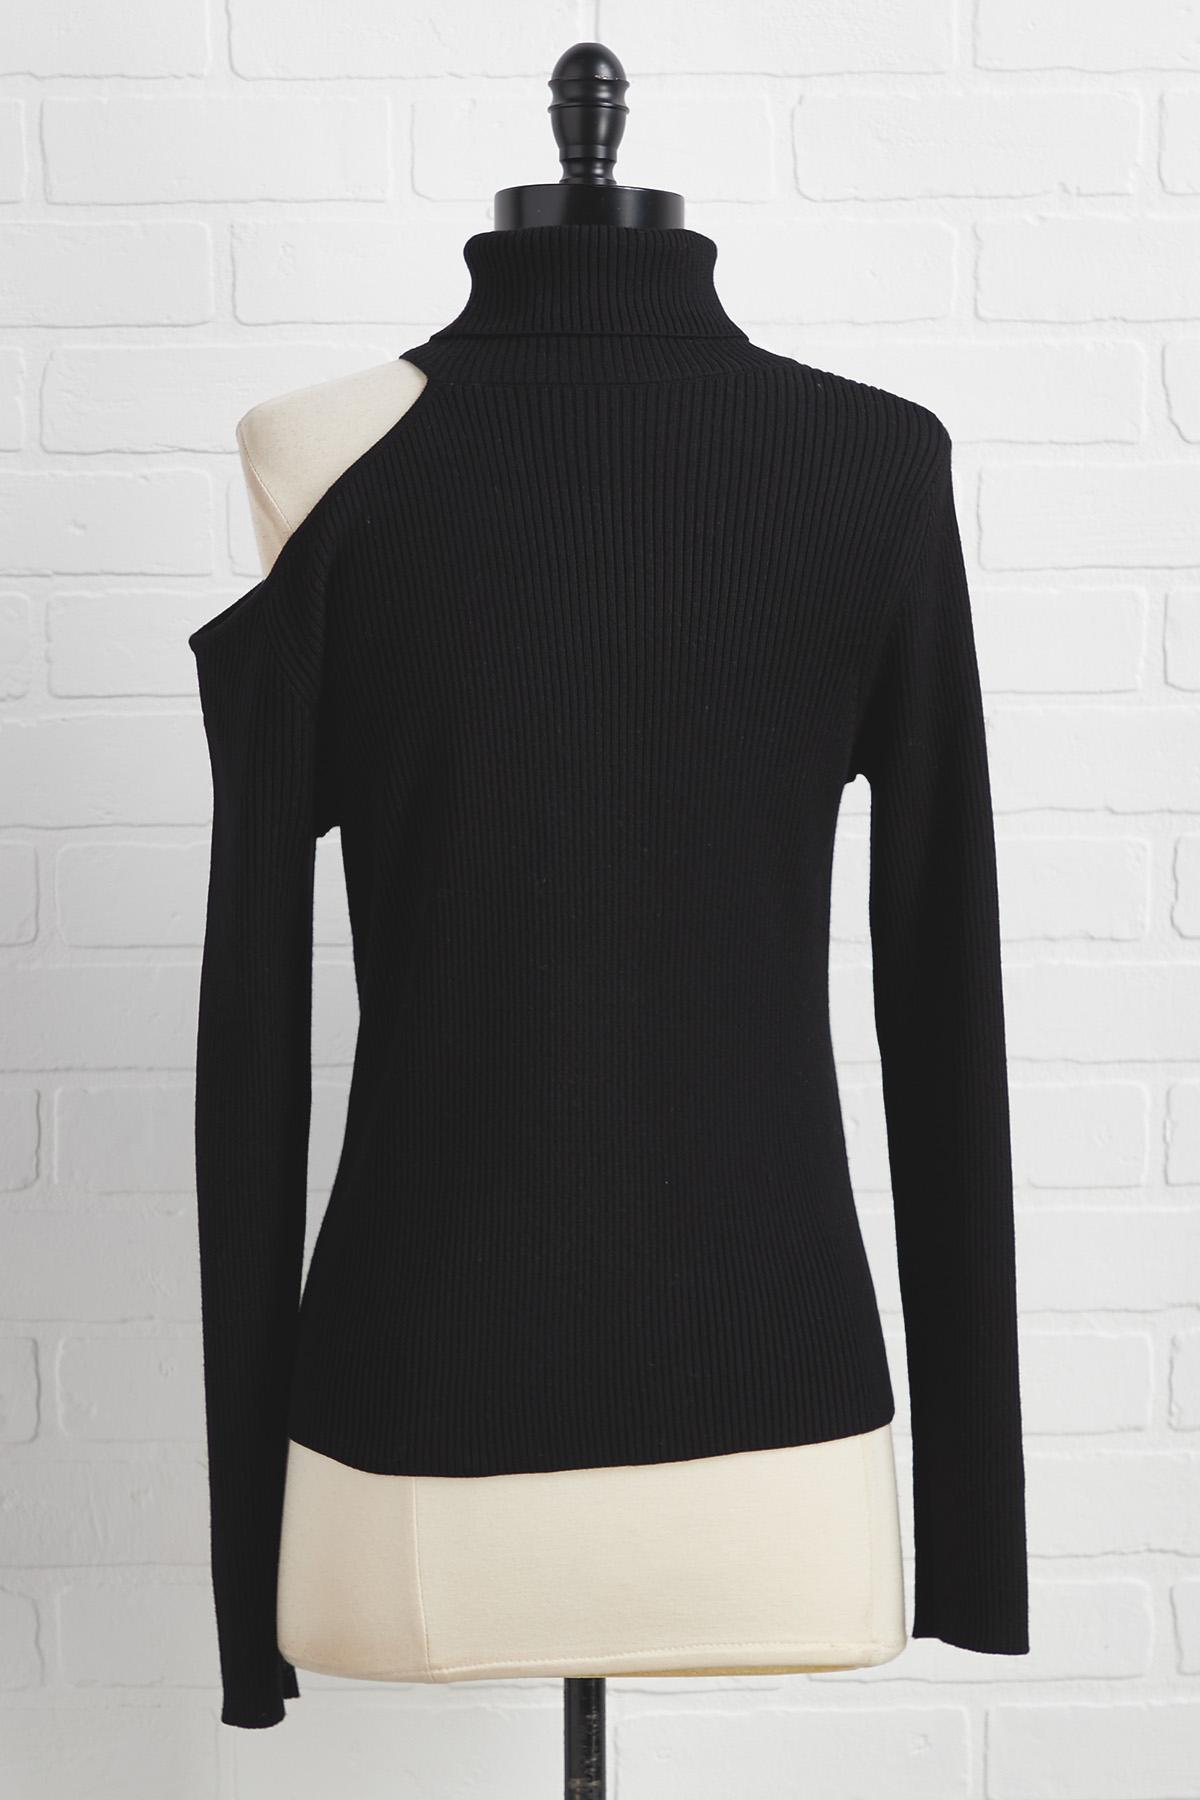 Cut It Out Turtleneck Sweater